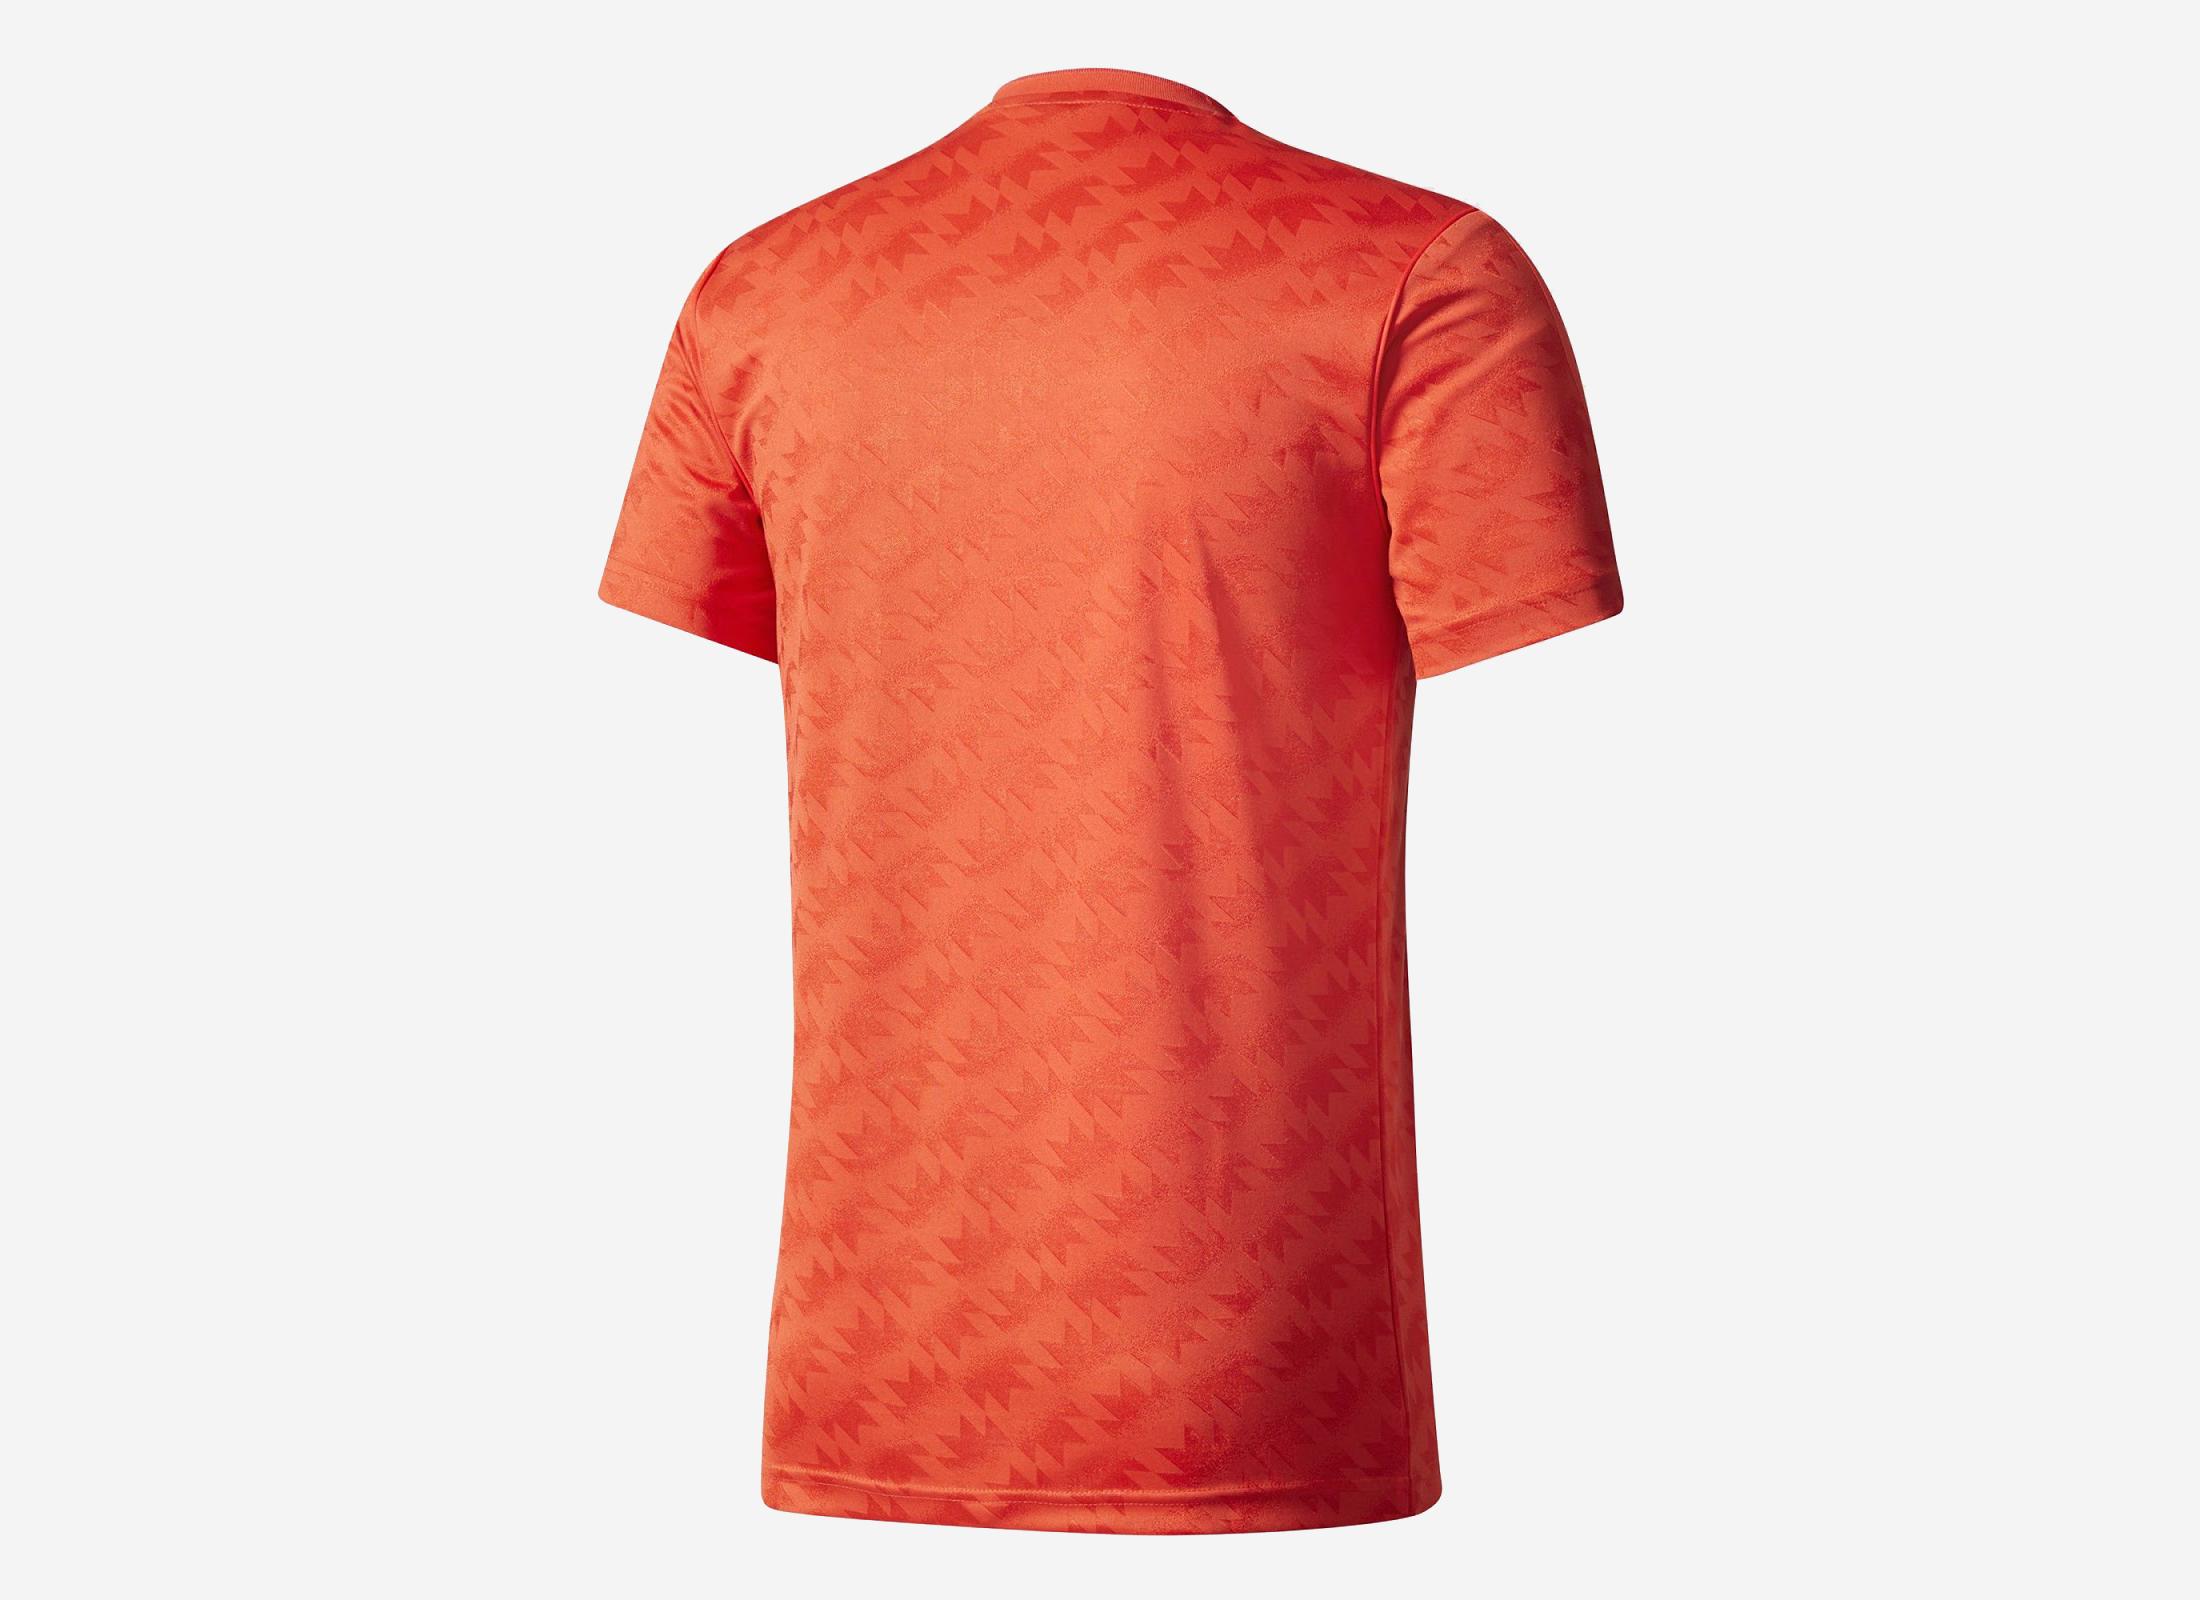 adidas-originals-man-utd-jersey-17-18 (3)